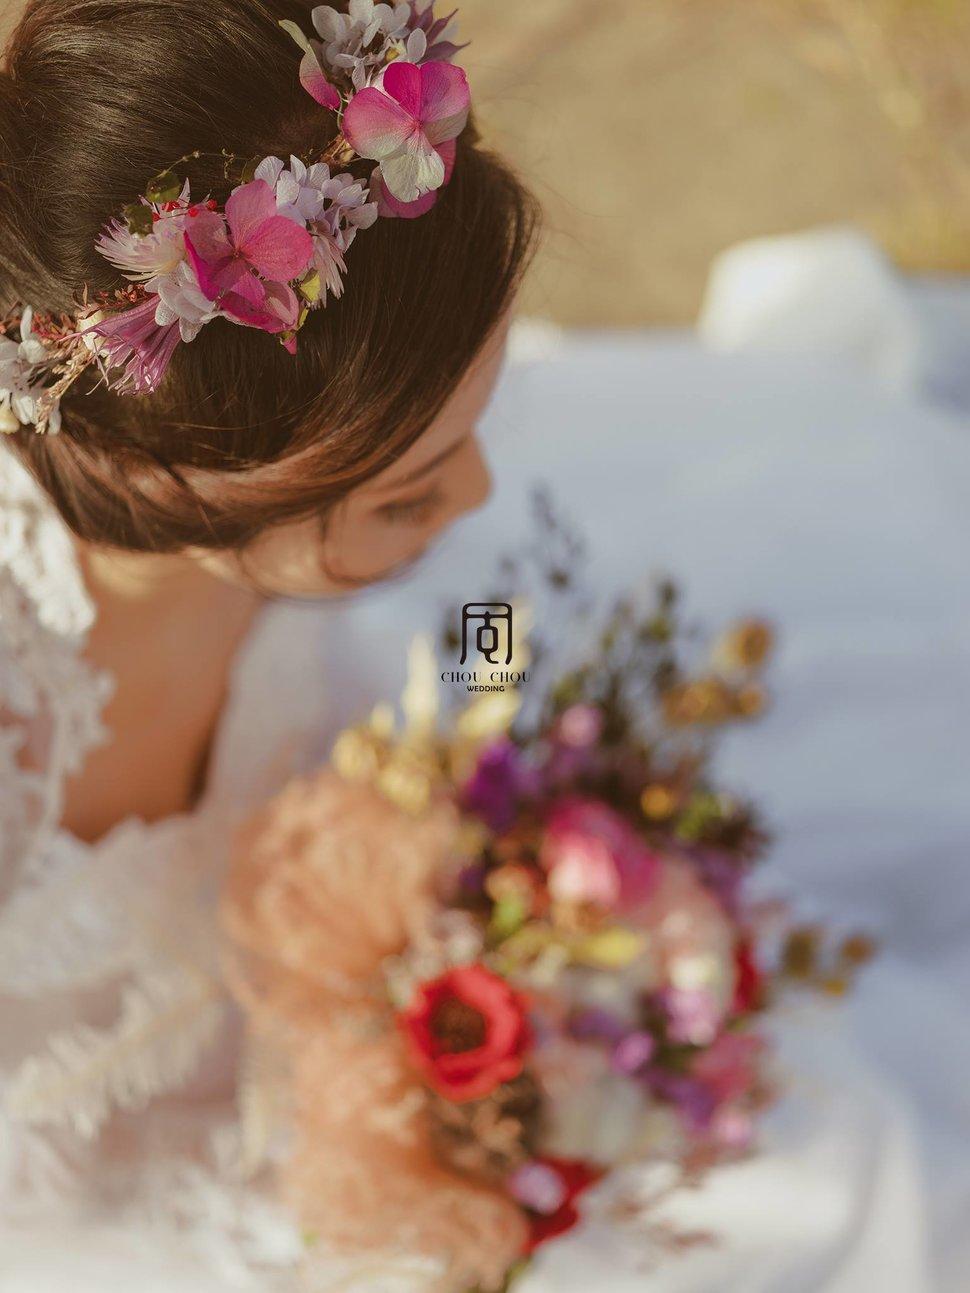 20157398_1526020180752913_7158013214620134381_o - Mia-Olove - 結婚吧